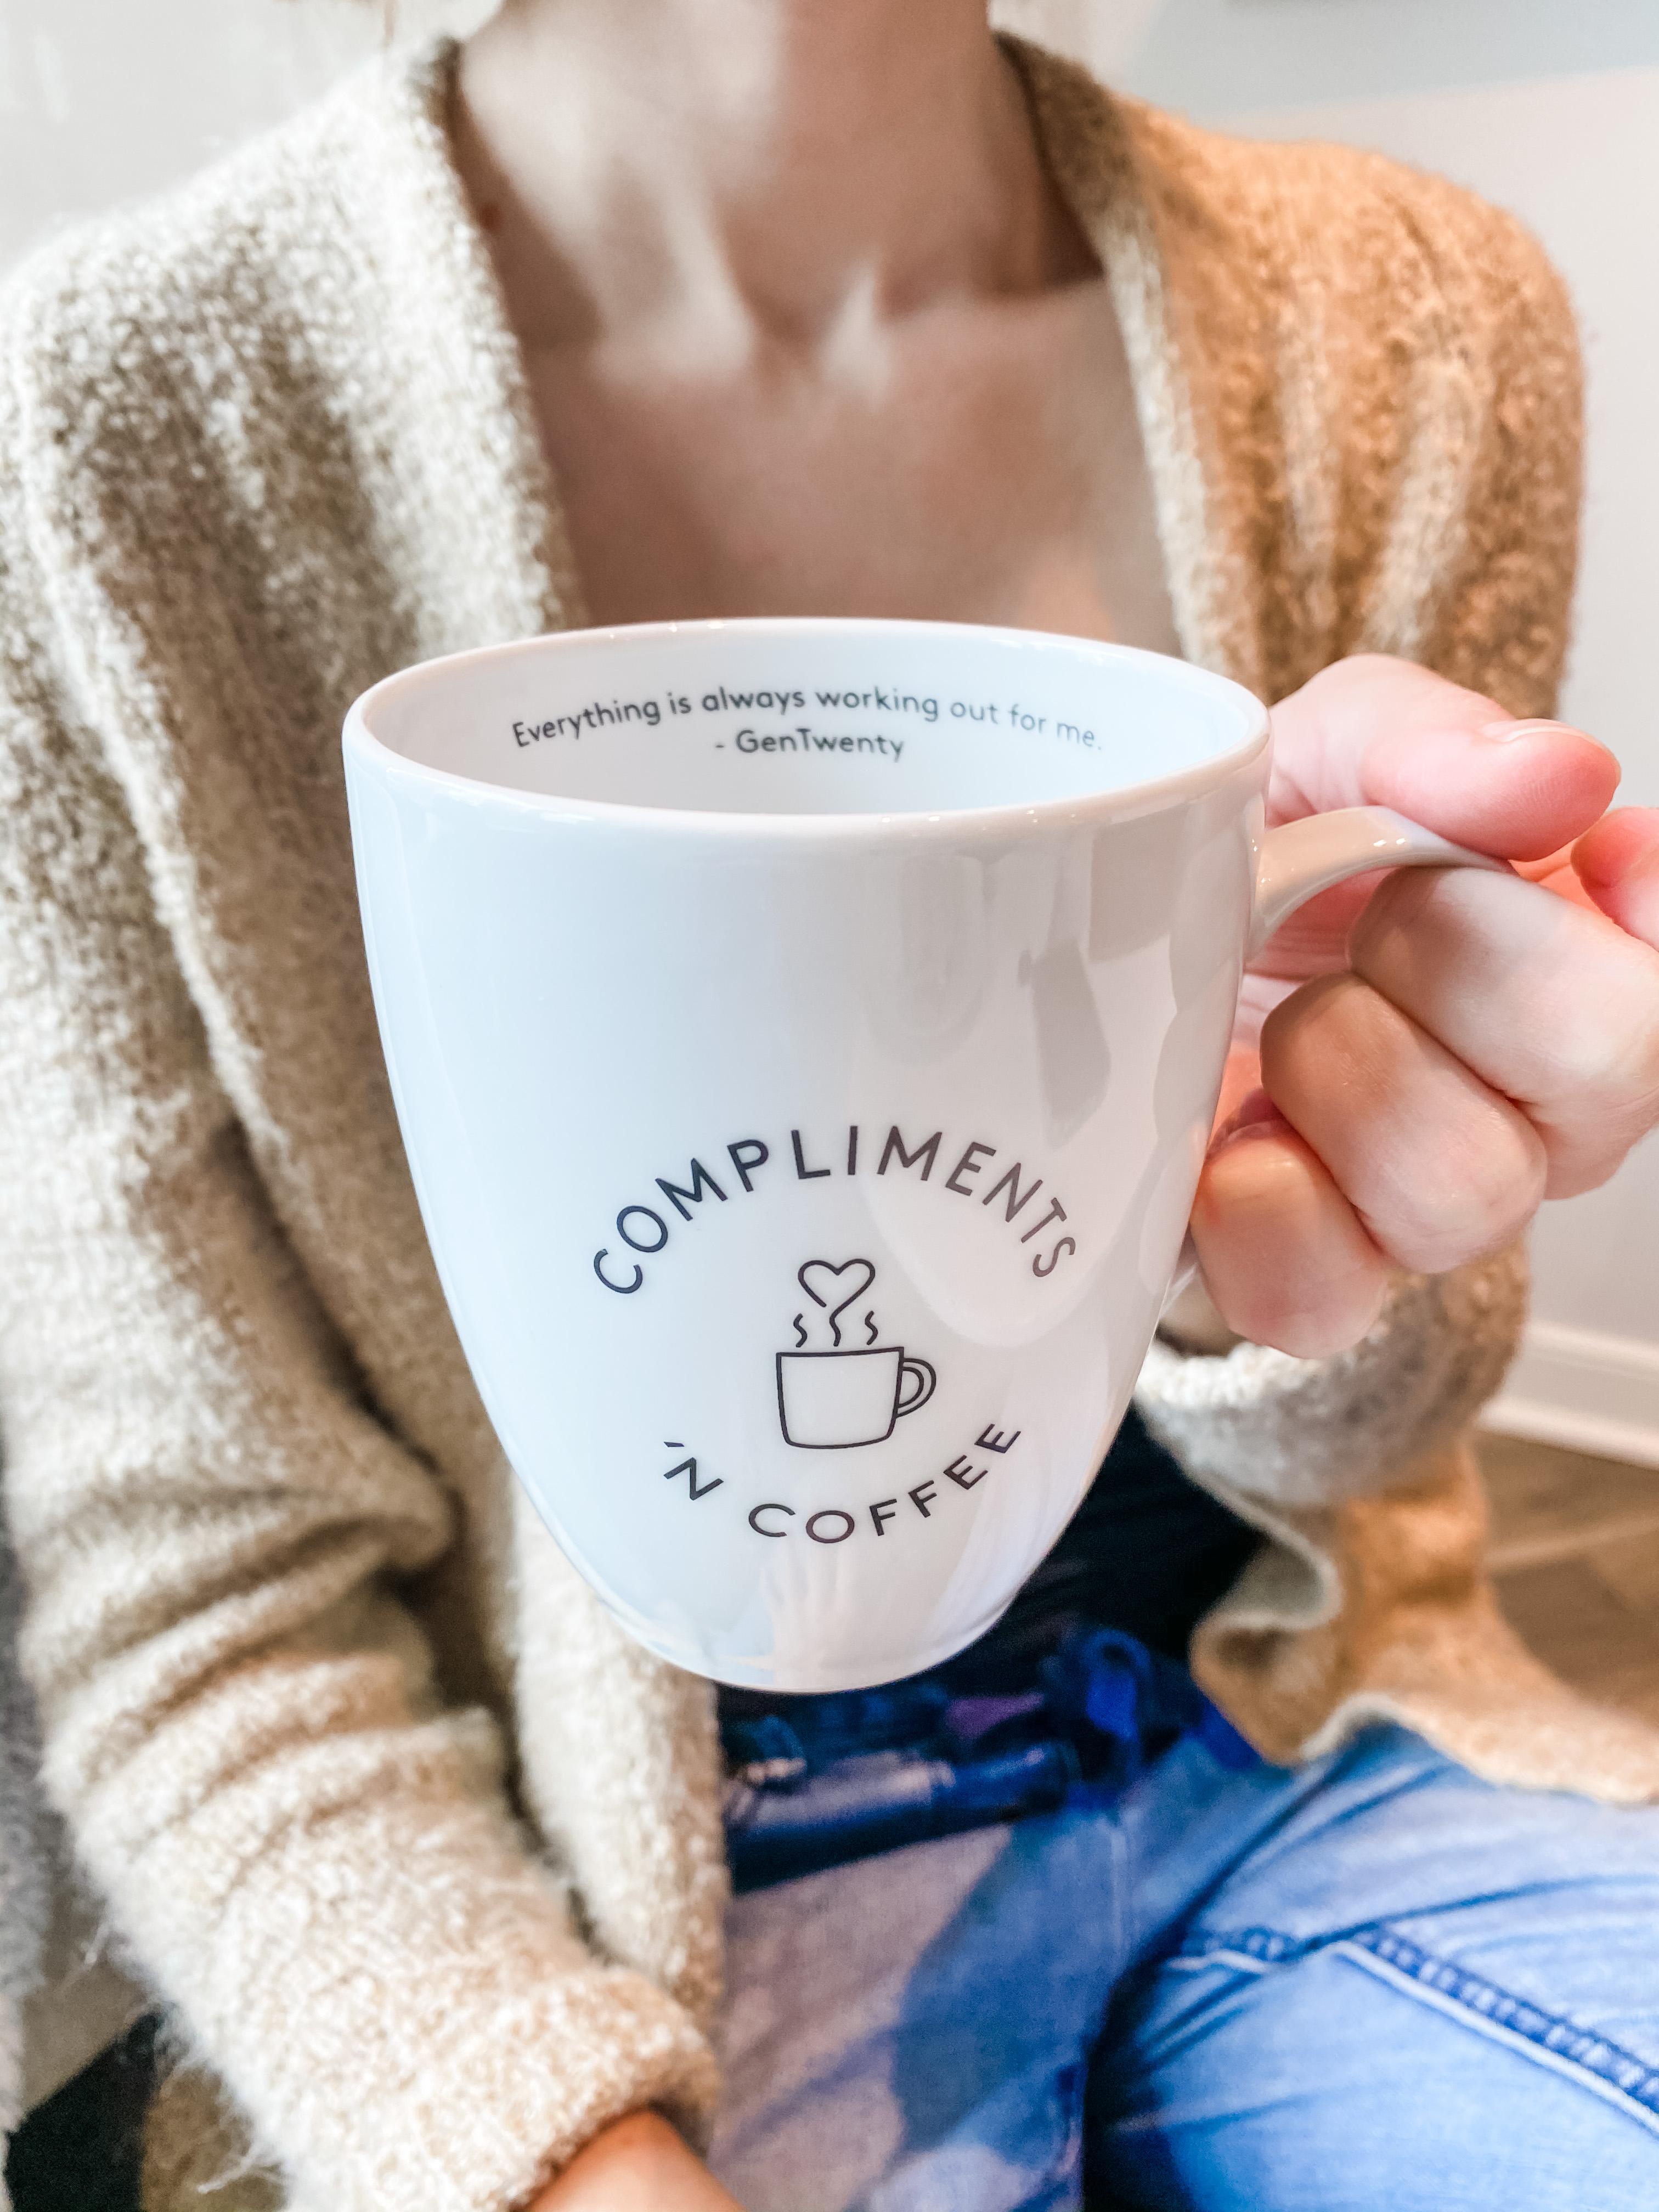 custom mug between gentwenty and compliments 'n coffee